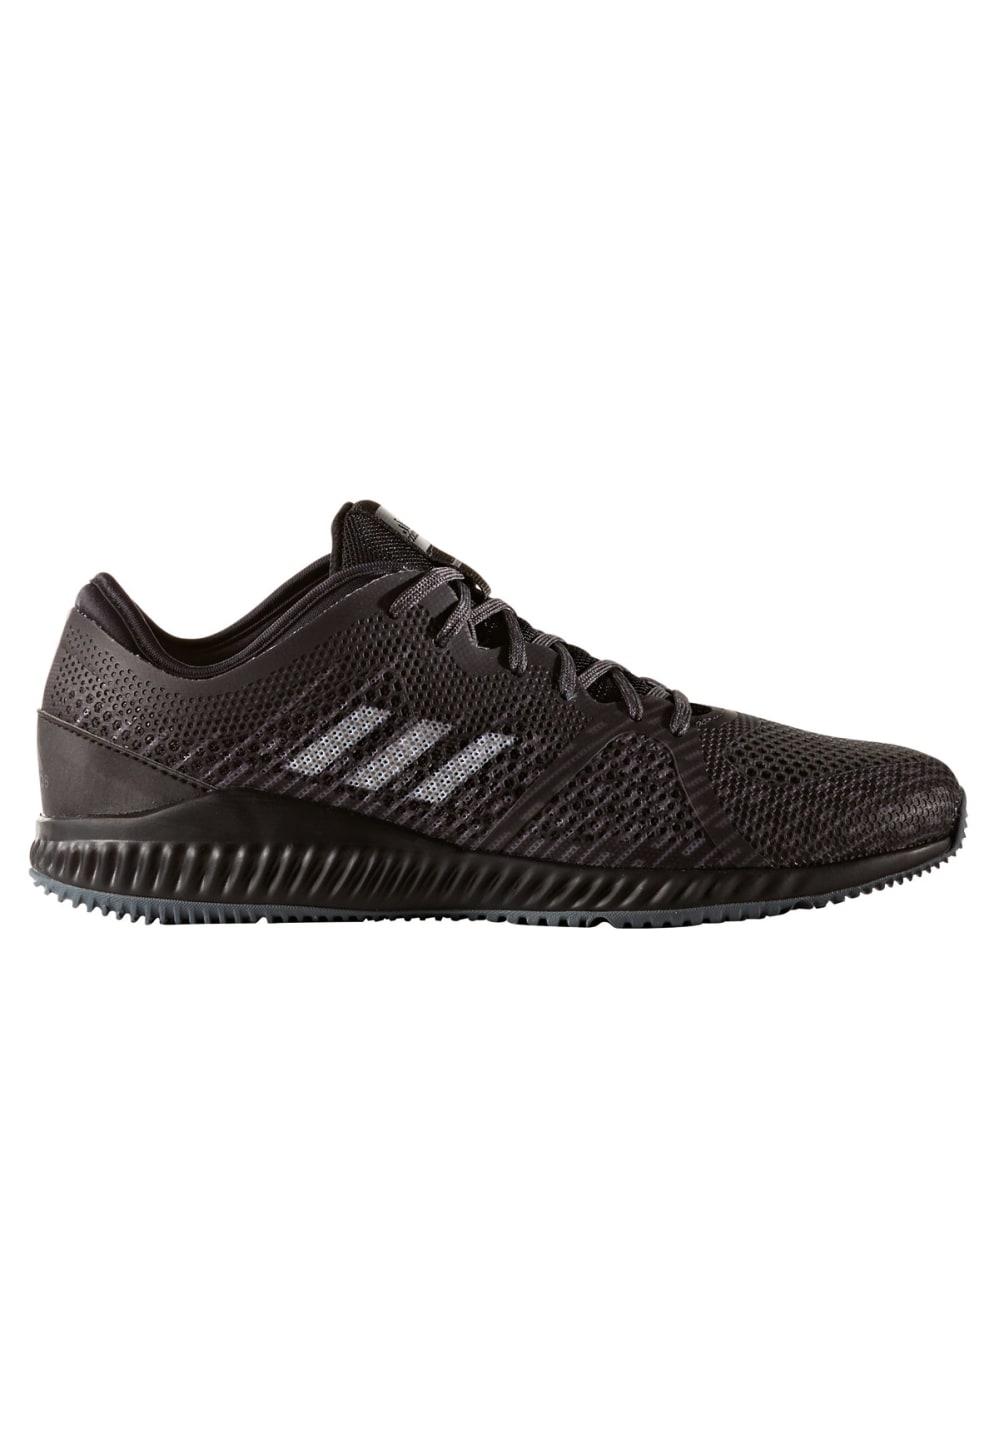 separation shoes cab3c b2810 adidas Crazytrain Bounce - Fitness shoes for Women - Black